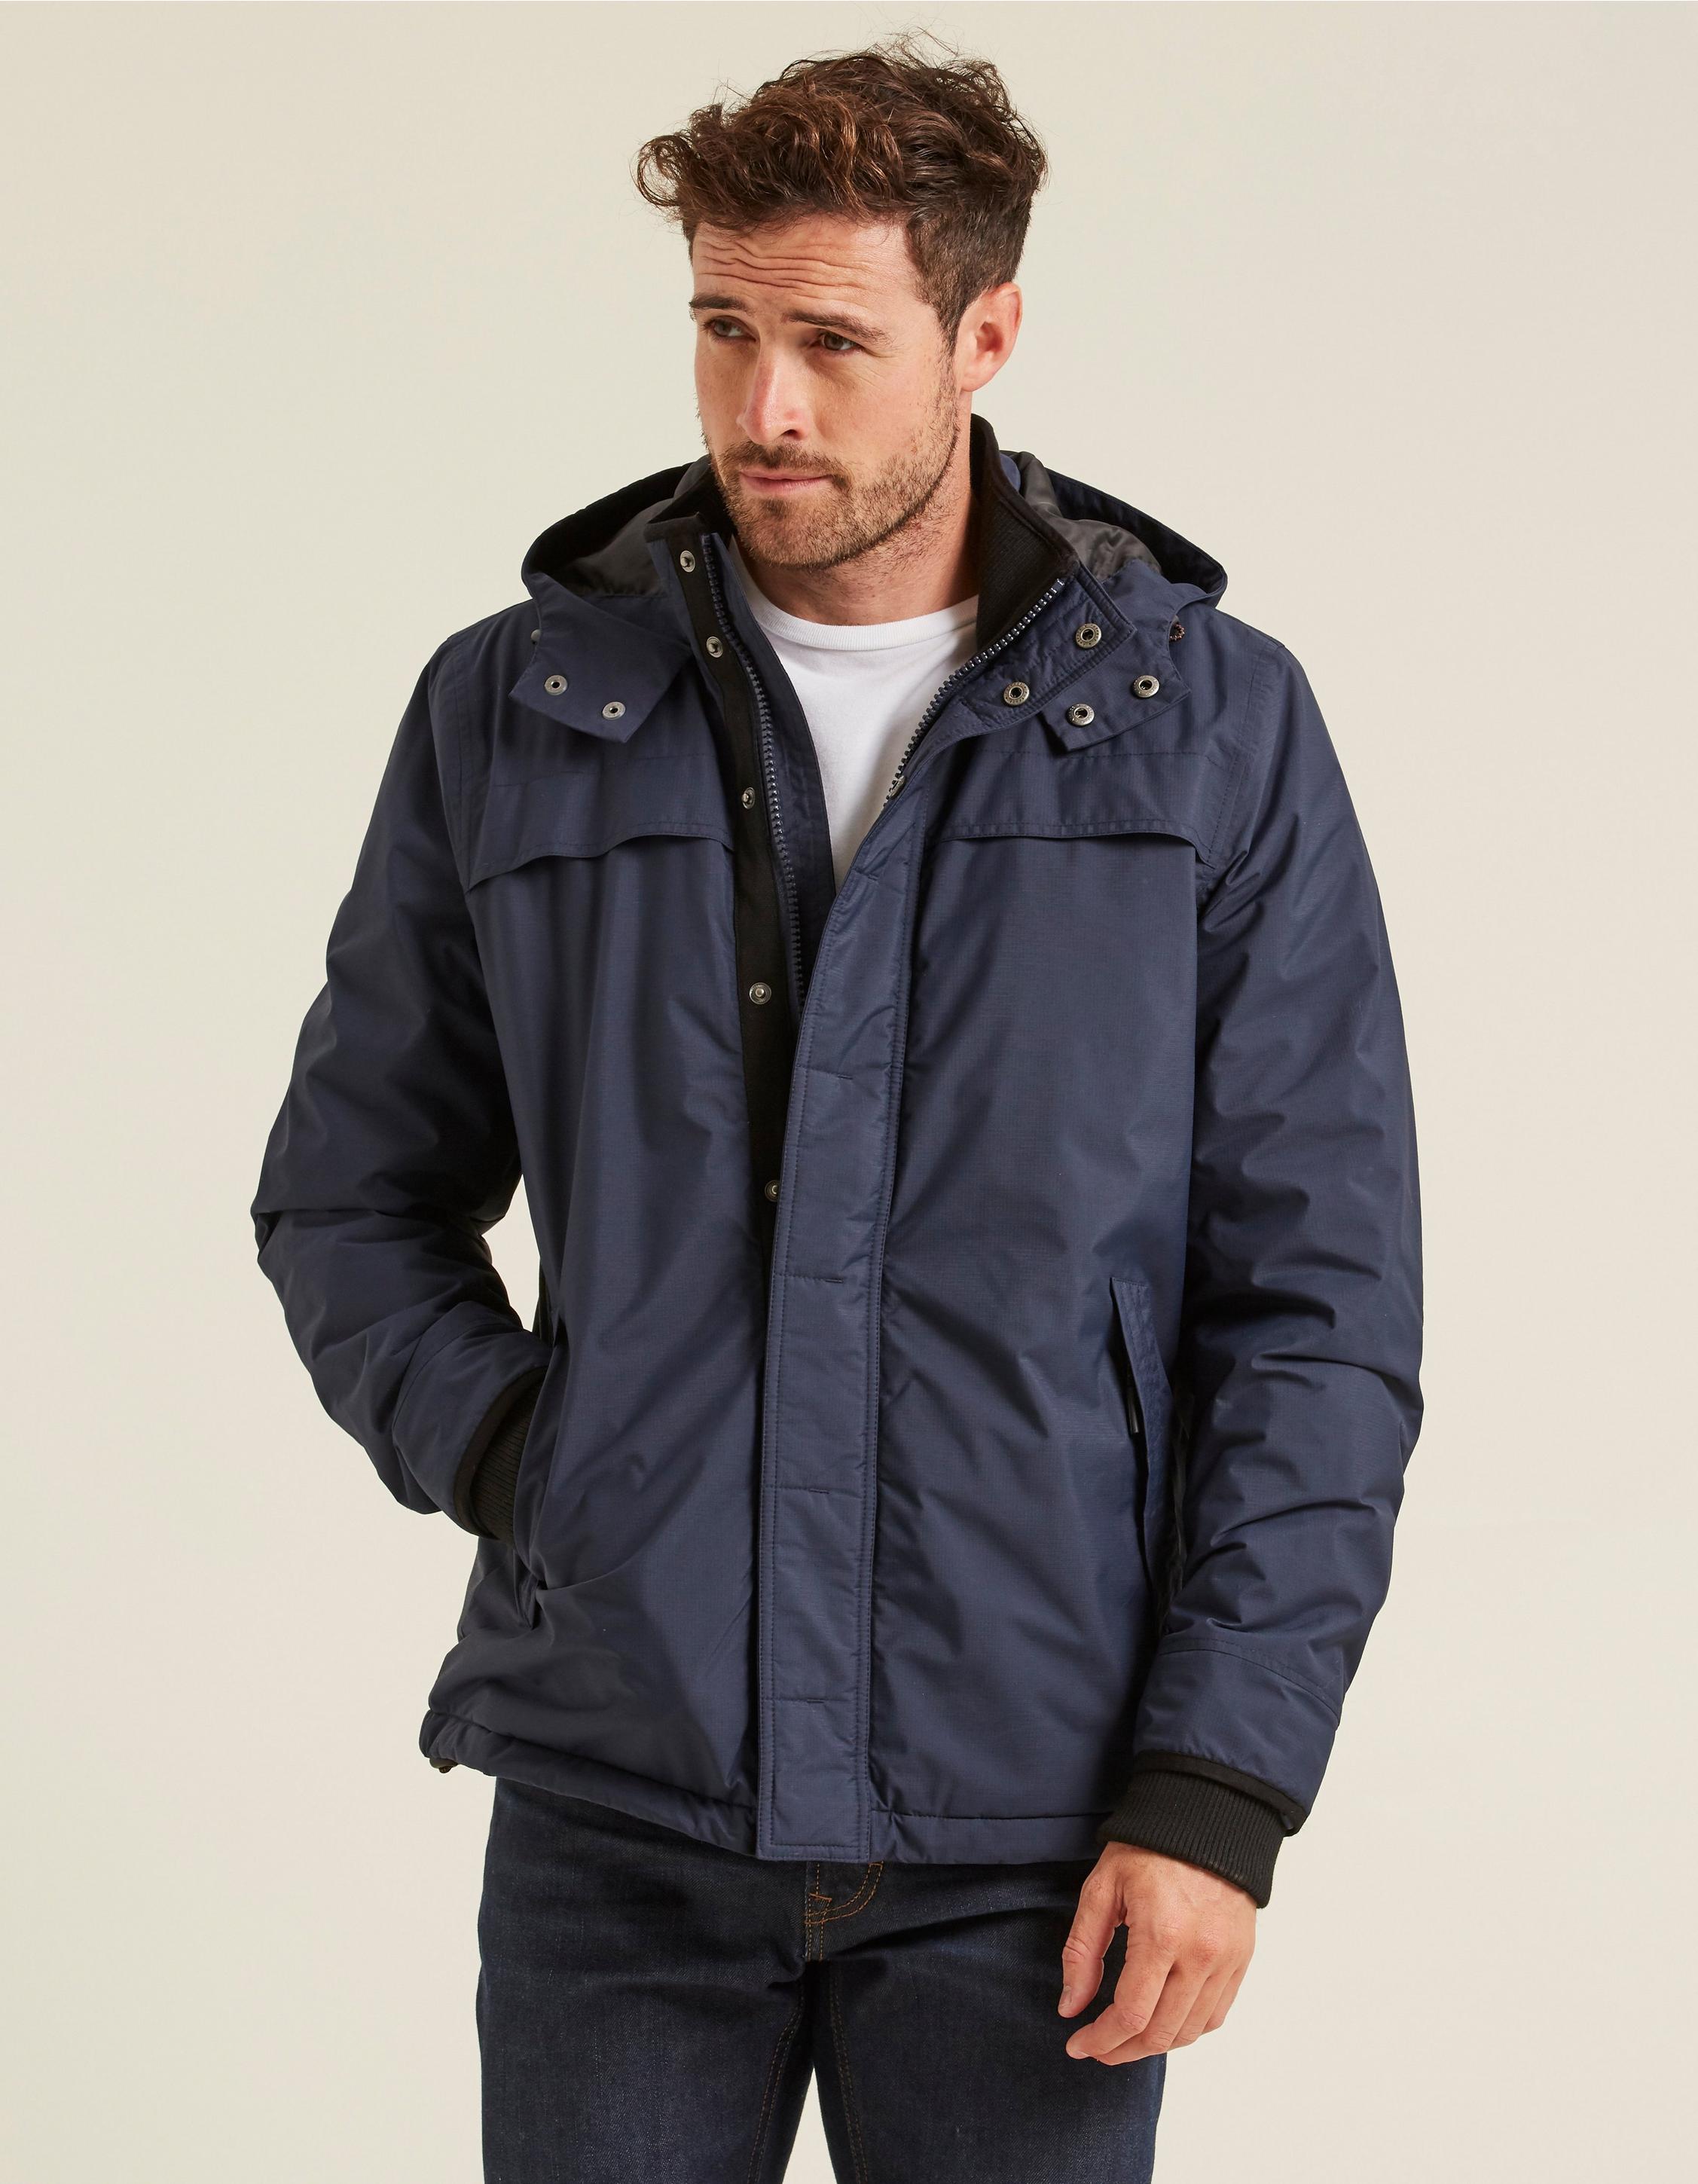 Fat Face Navy Barrier Jacket. £79.00